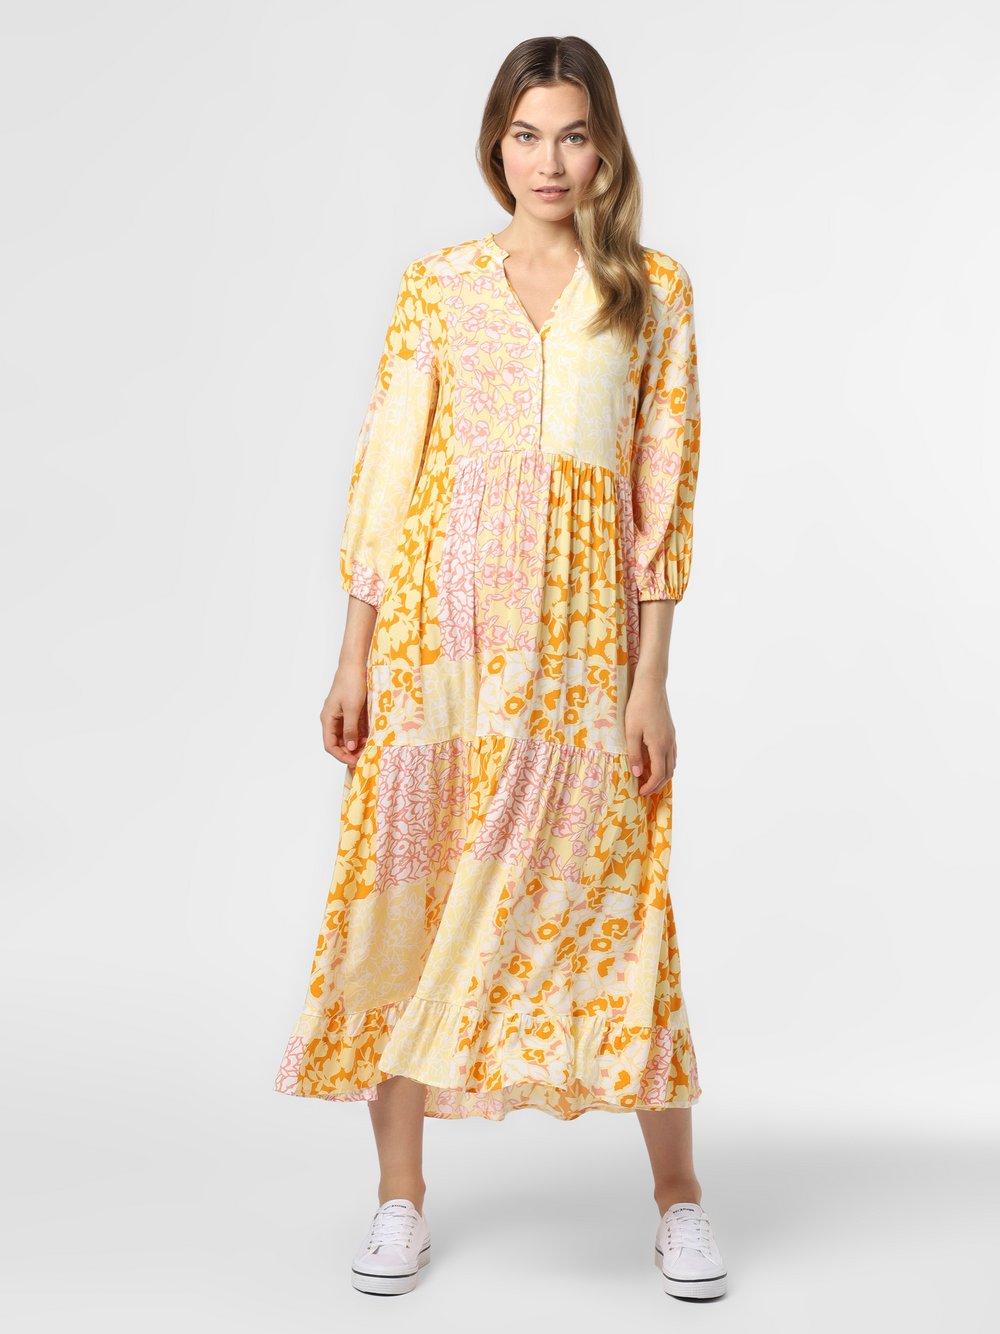 Y.A.S – Sukienka damska – YASPatcha, żółty Van Graaf 469184-0001-09960